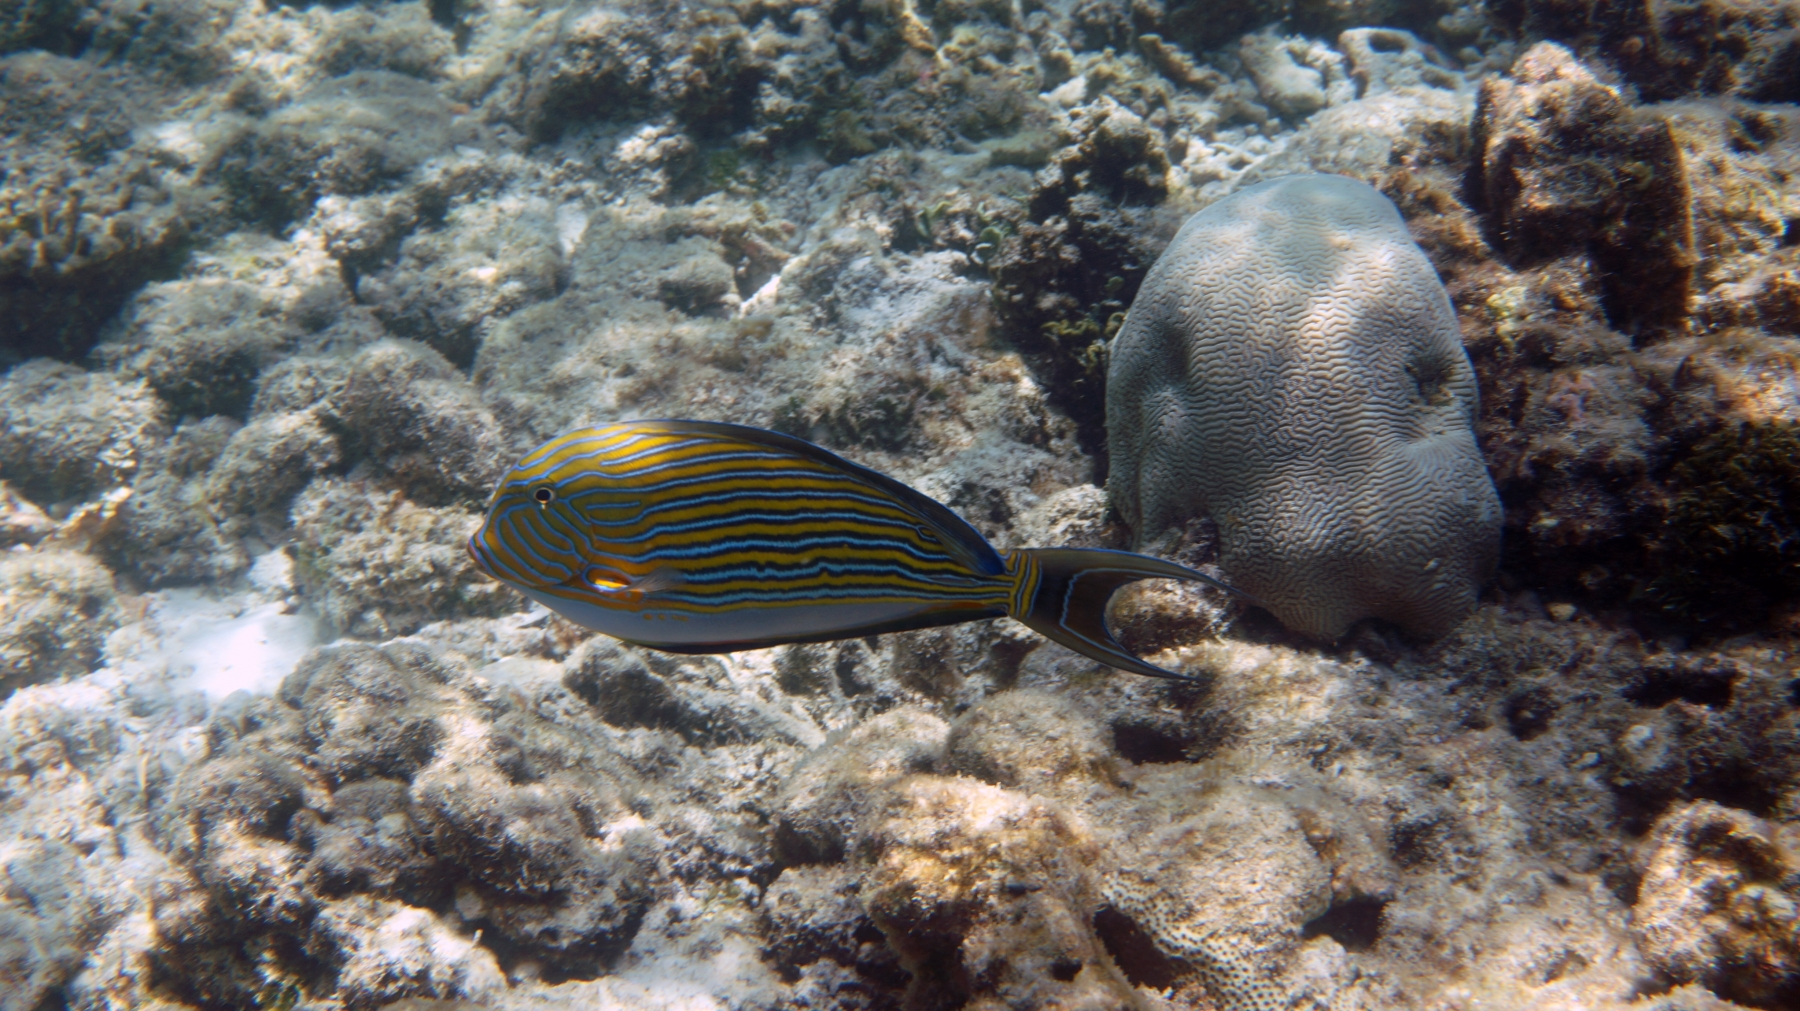 Acanthurus_lineatus_003_C_Peces-Cirujano_L_Maldivas_U_Sebas_02072015